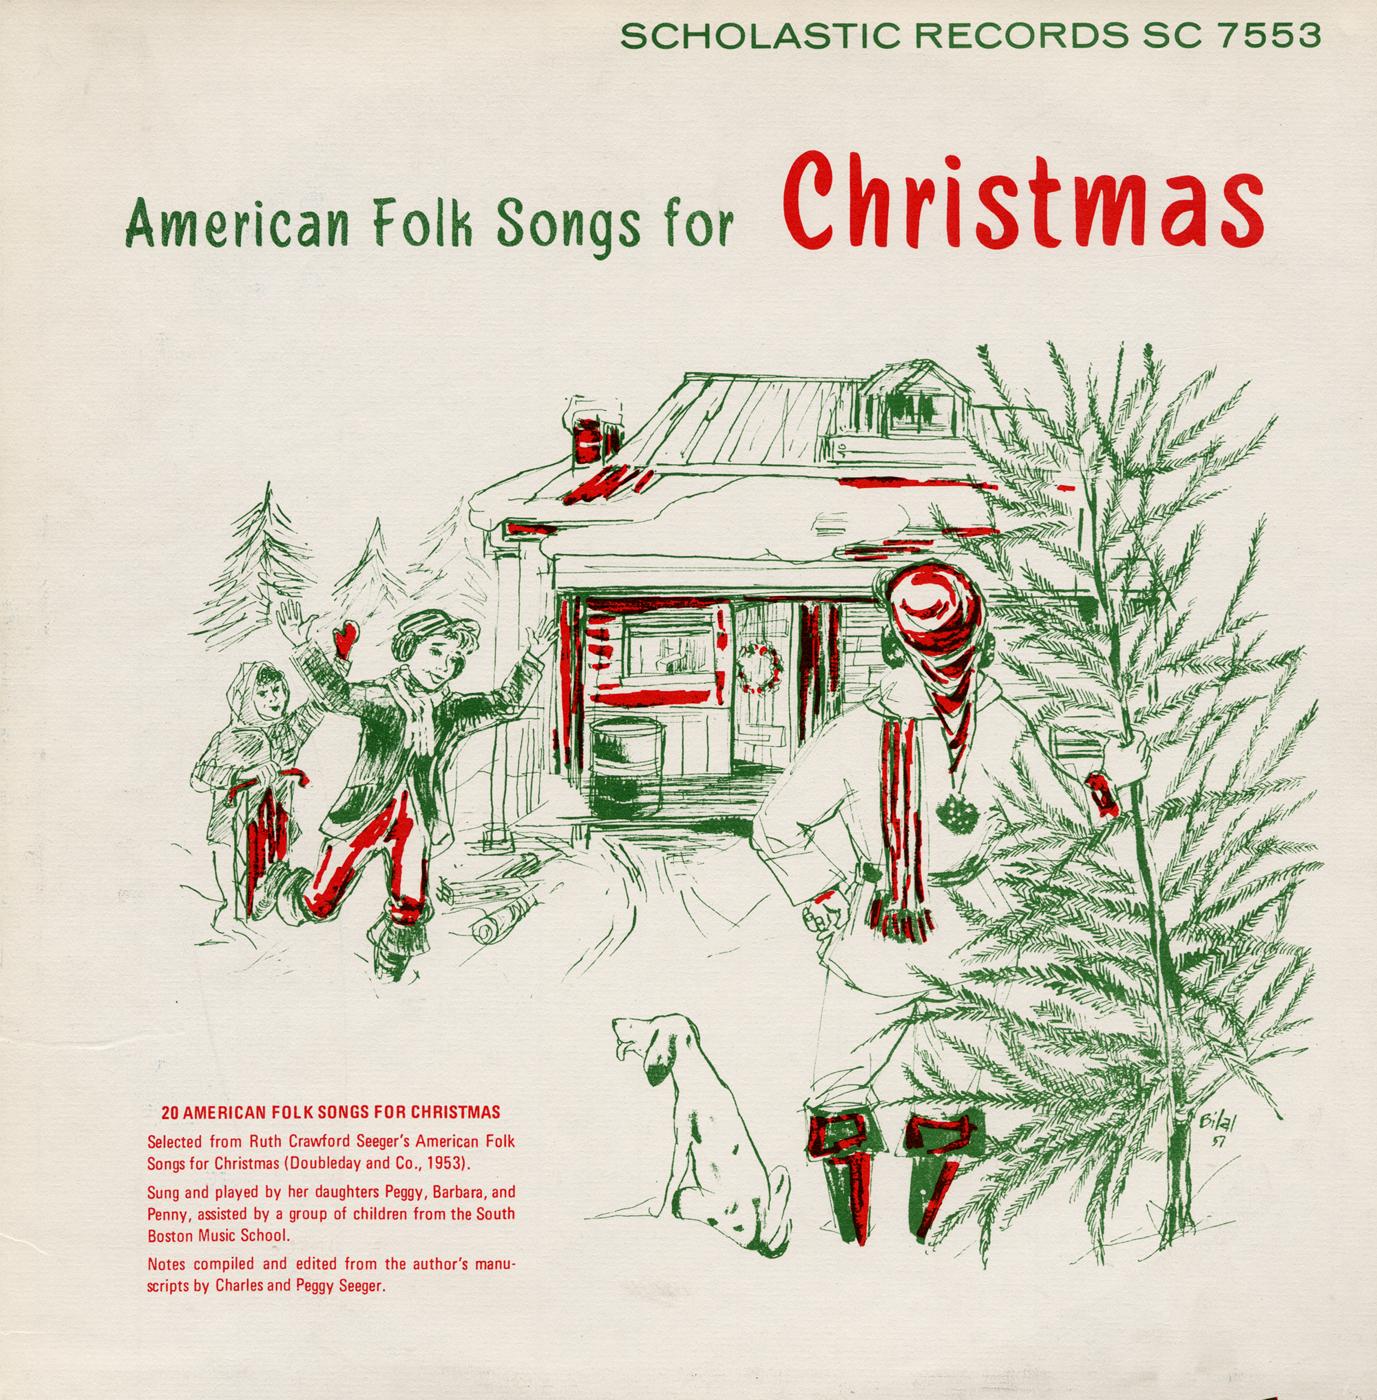 American Folk Songs for Christmas | Smithsonian Folkways